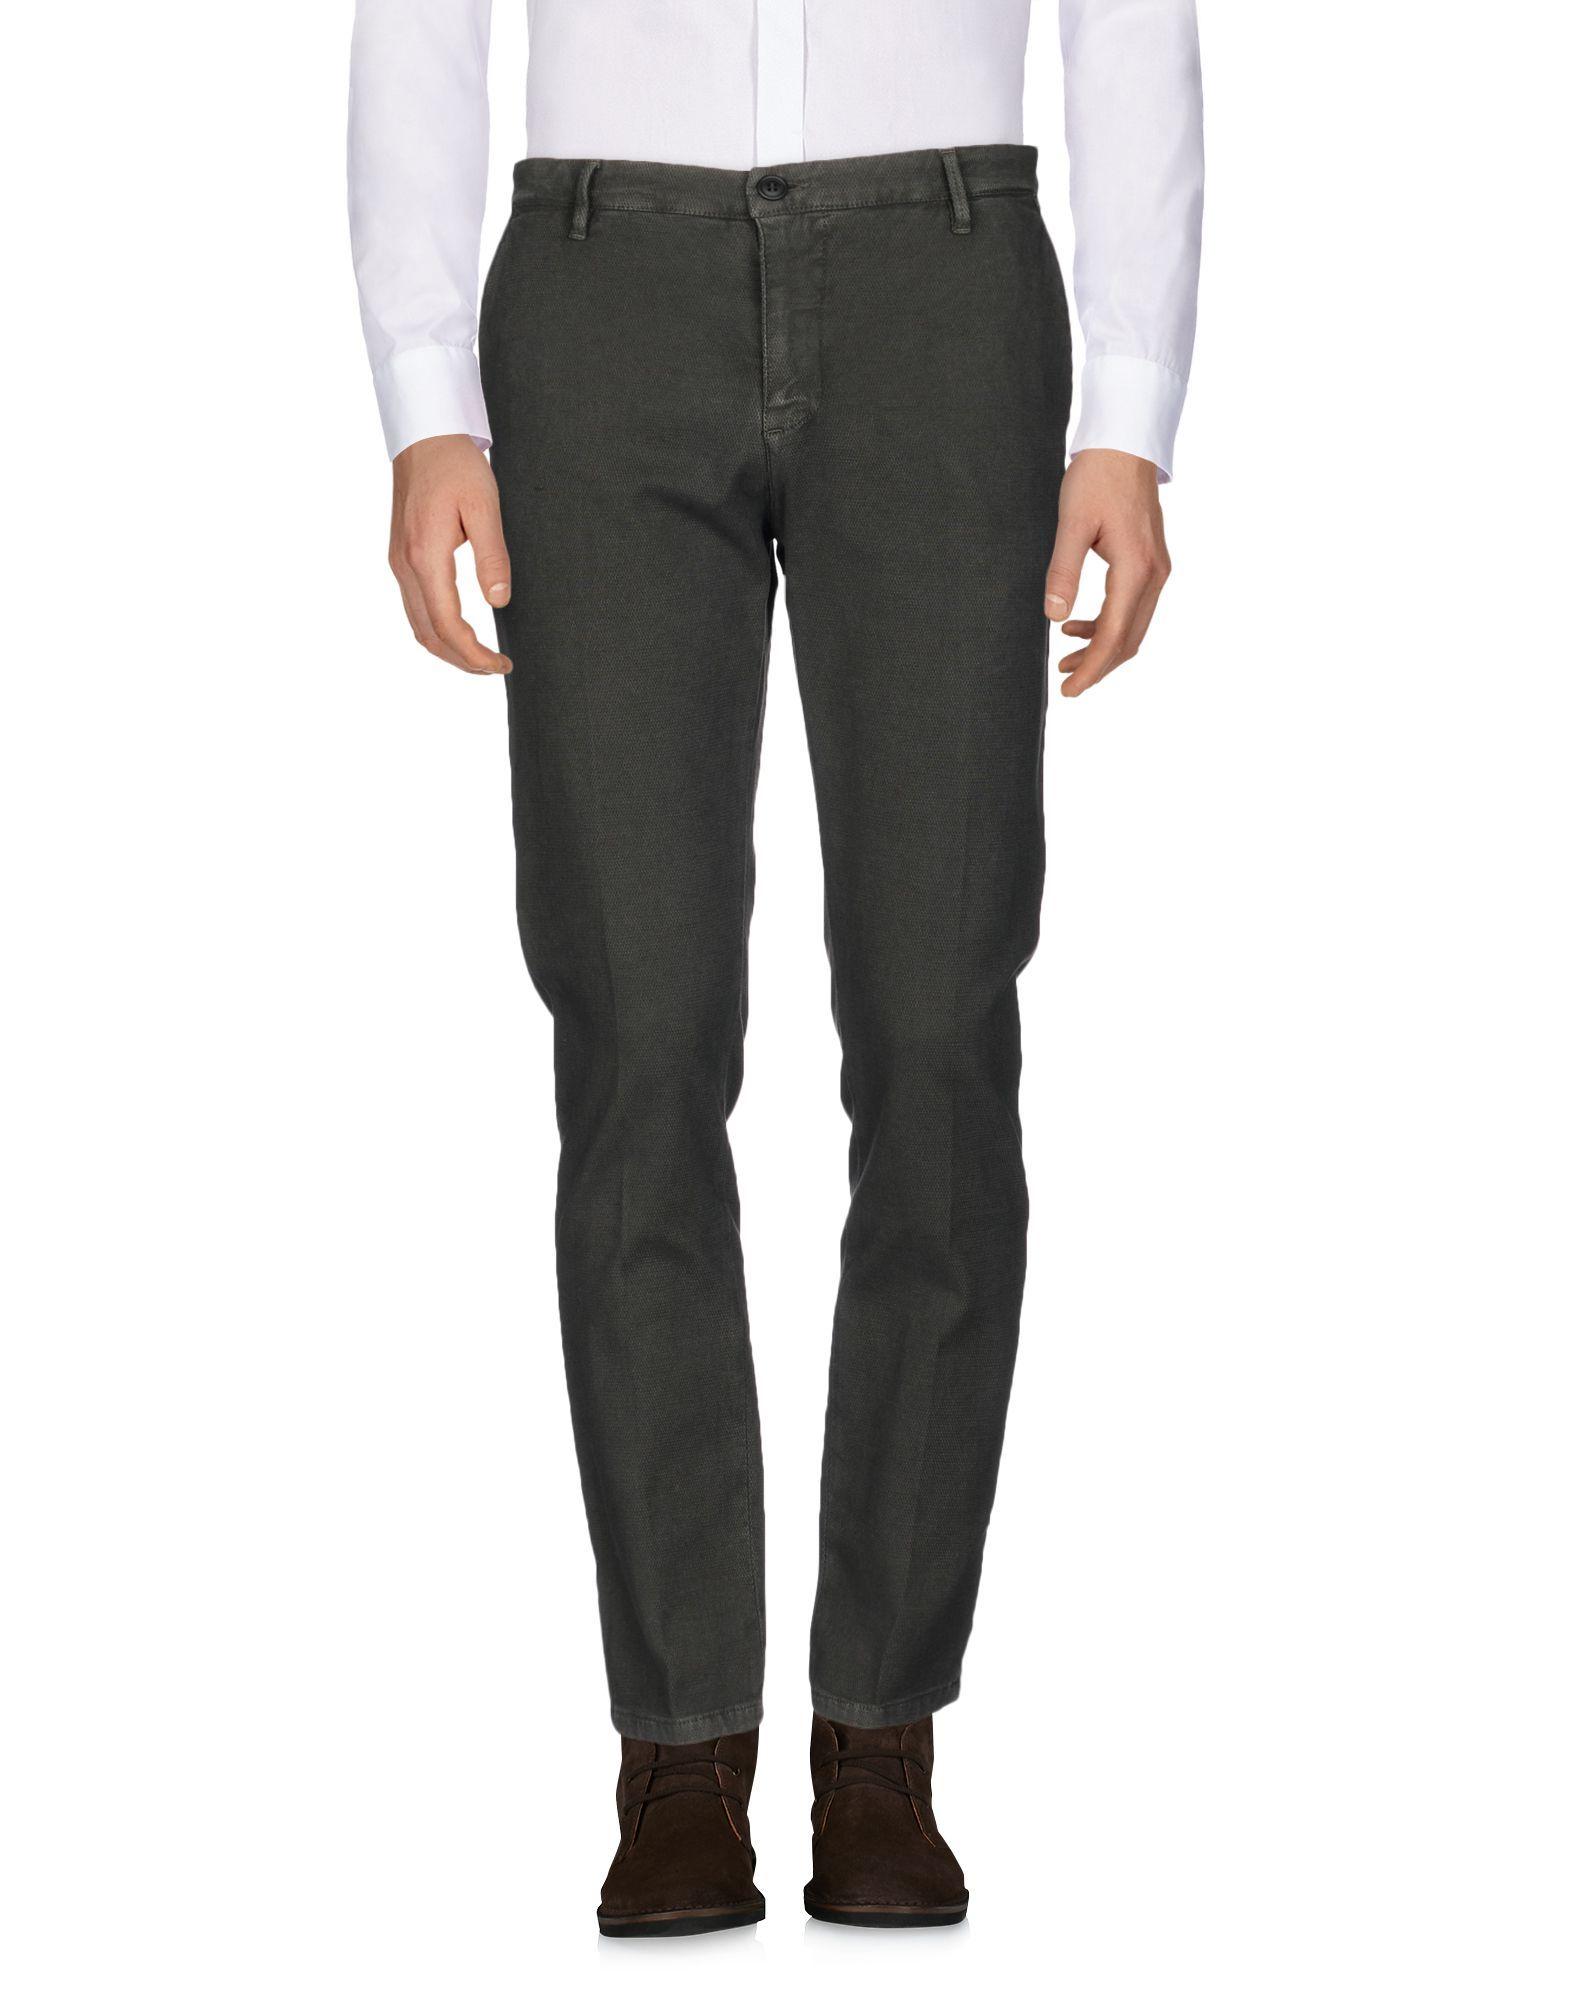 Hamaki-Ho Dark Green Cotton Trousers